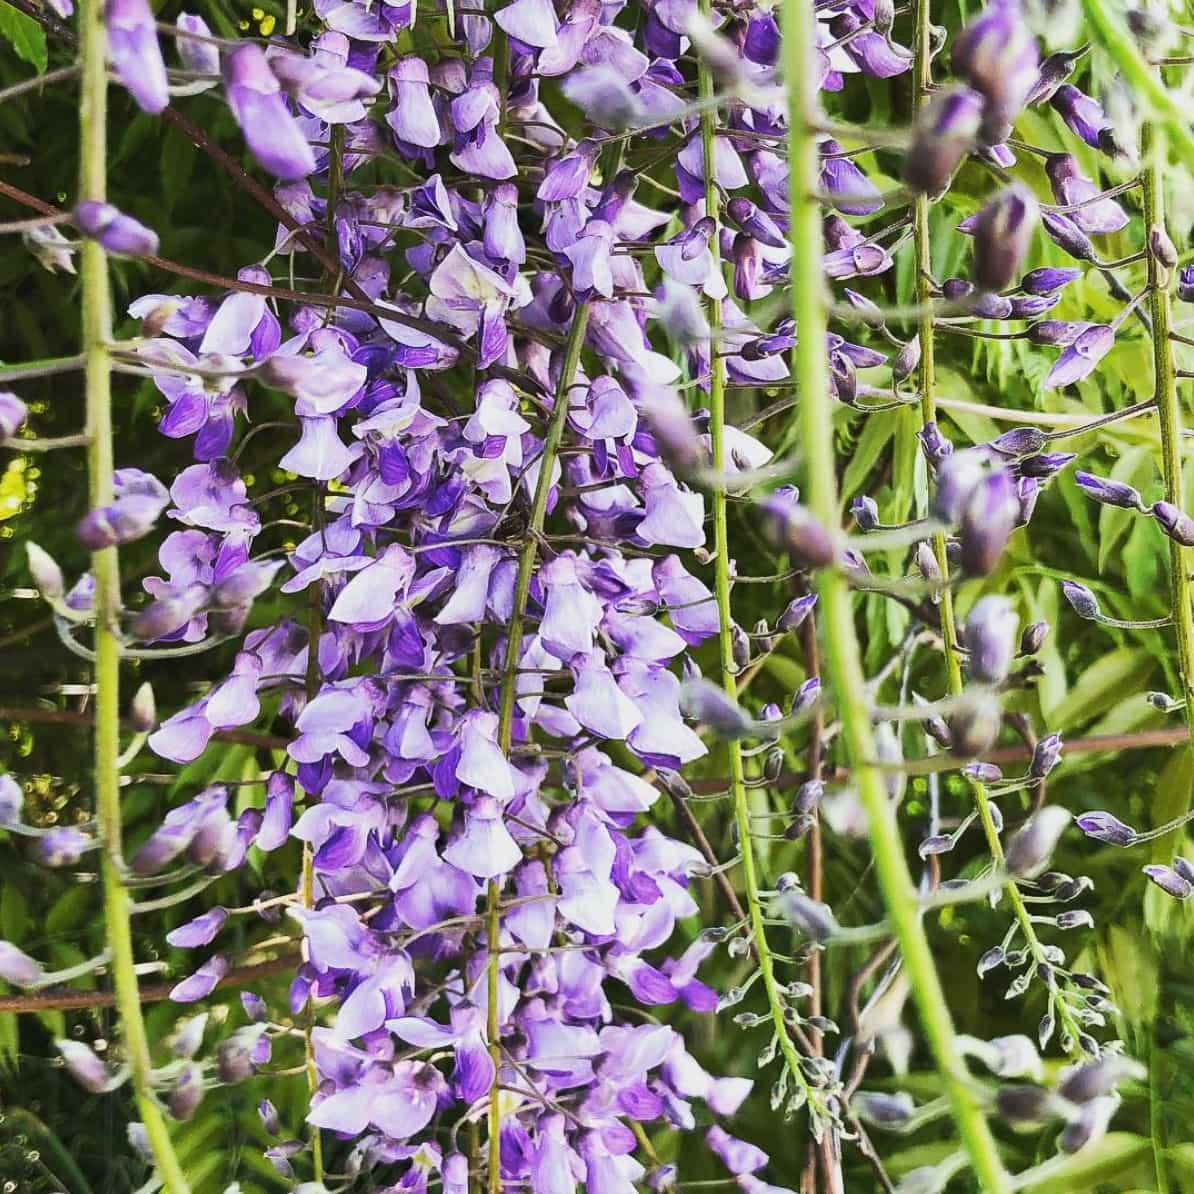 10 Things Every Beginning Gardener Should Know - Healing Harvest Homestead